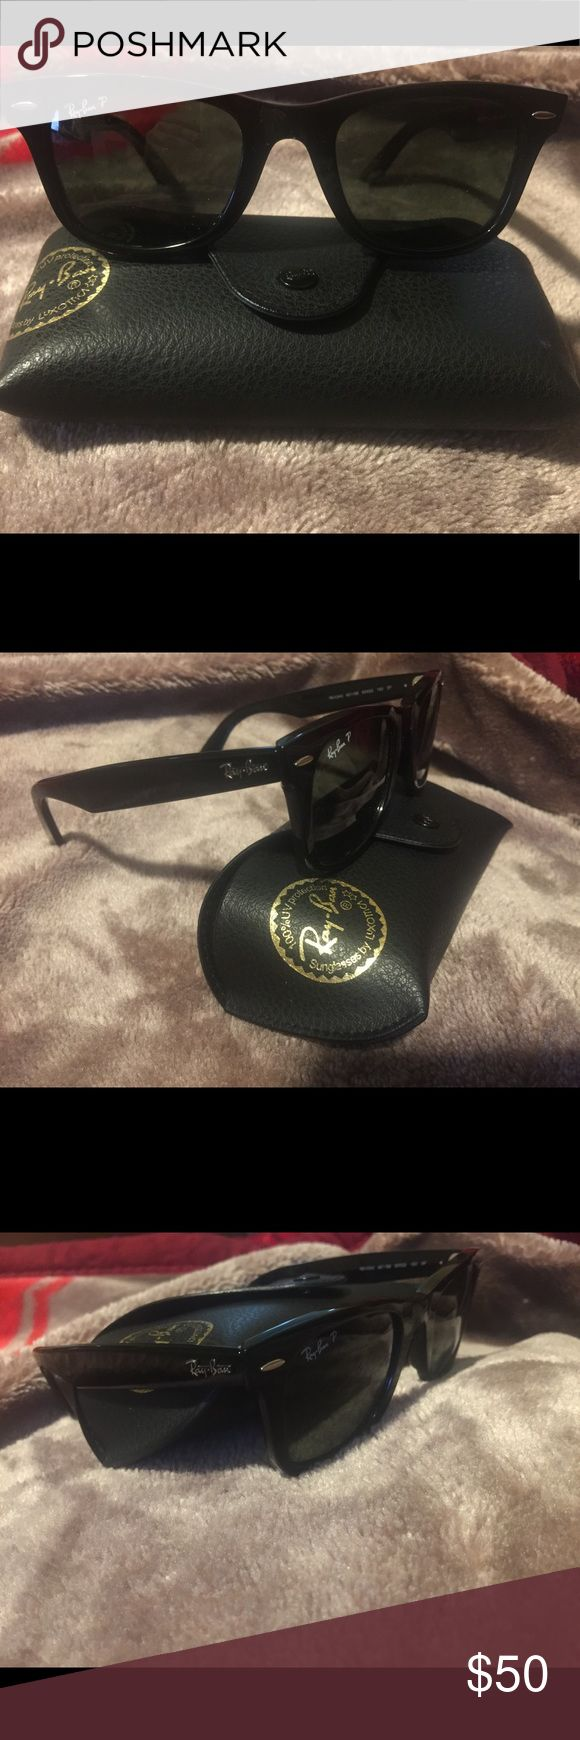 Ray Ban Original Wayfarer Black Black Original Wayfarer *women's?* / In excellent condition / Selling with case Ray-Ban Accessories Sunglasses